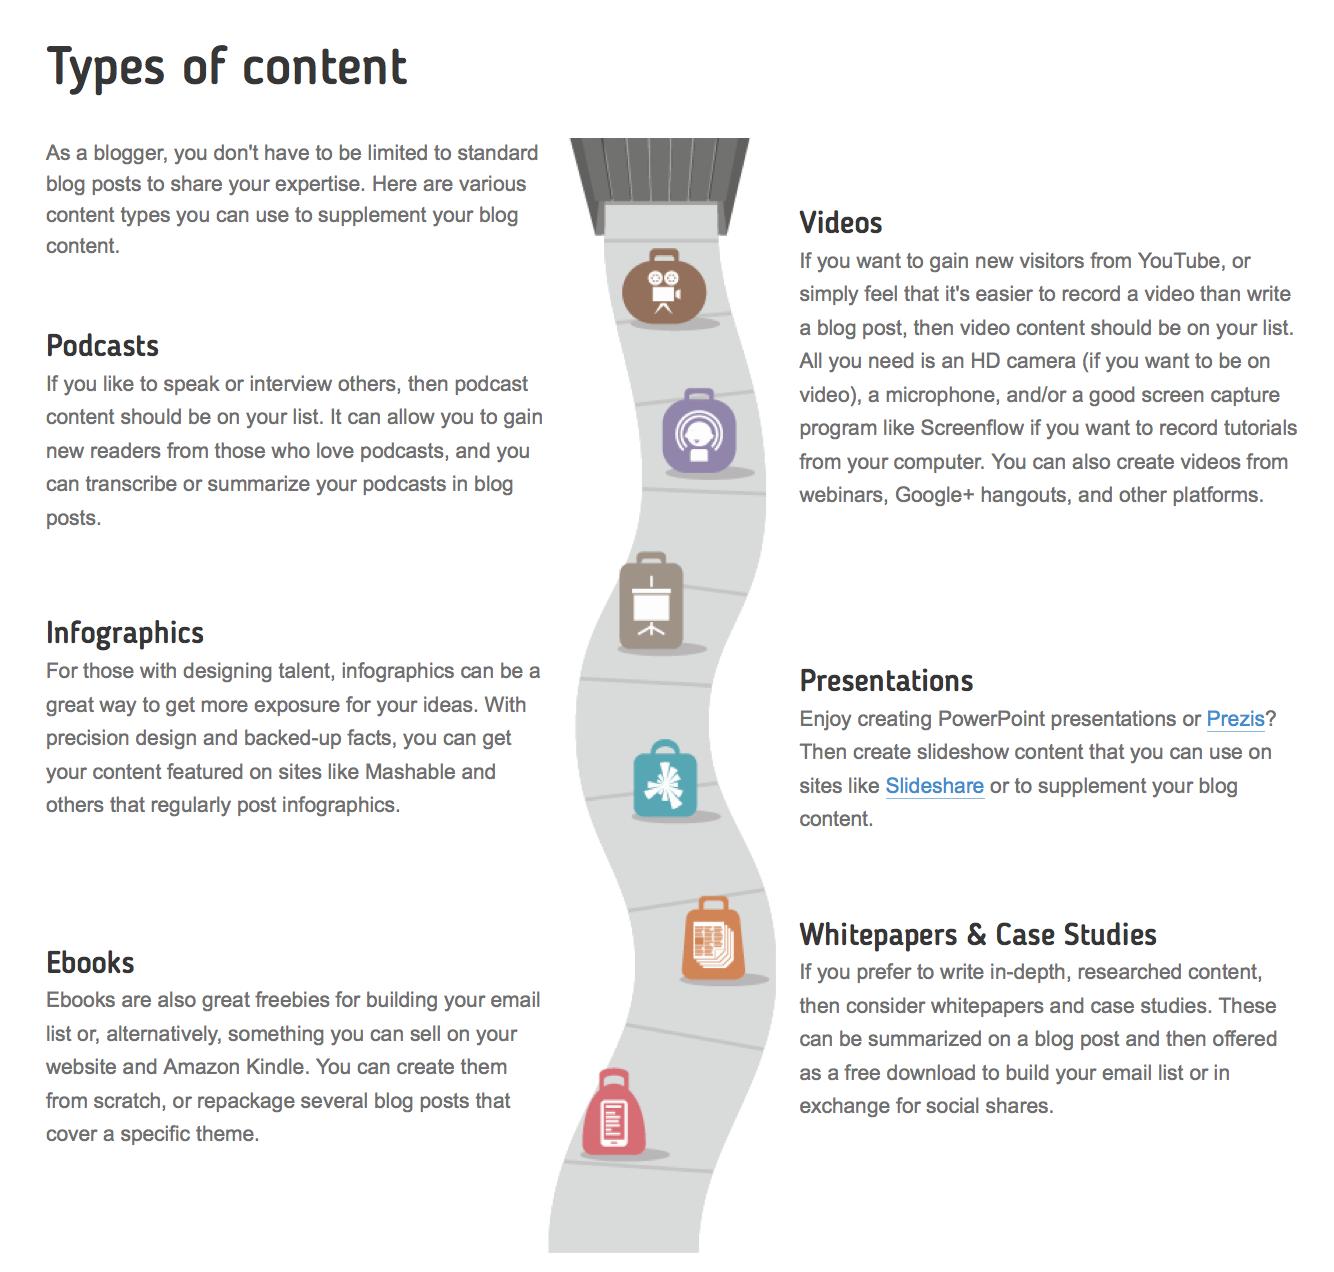 blog-a-lot-types